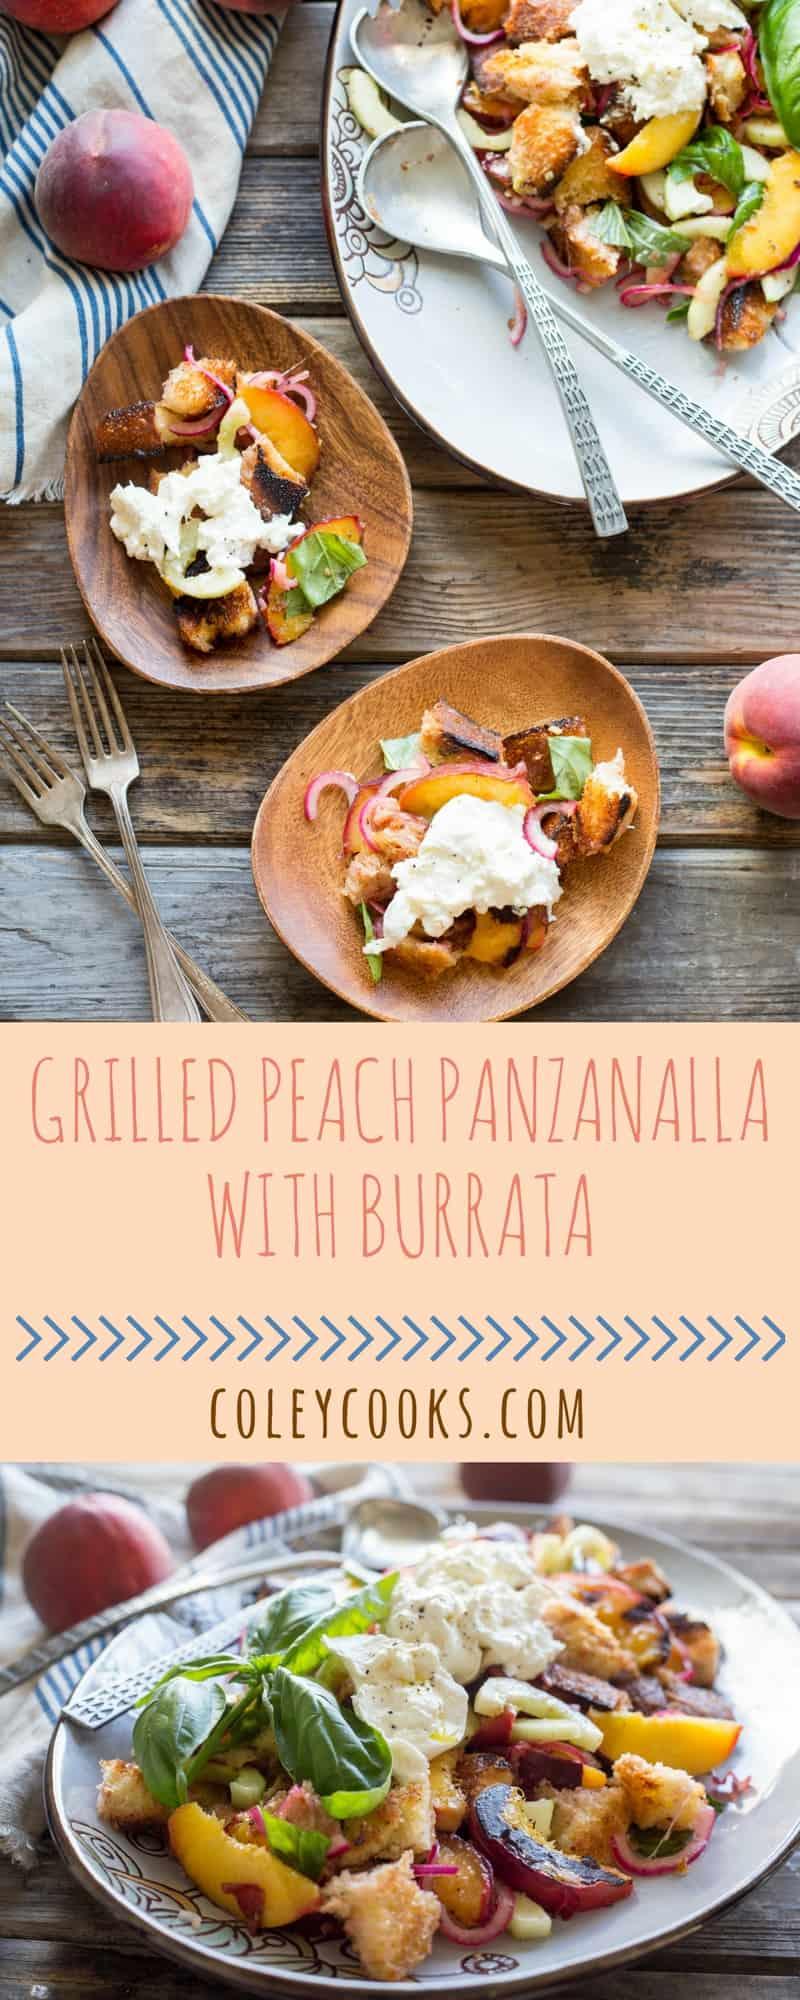 Grilled Peach Panzanella with Burrata | ColeyCooks.com